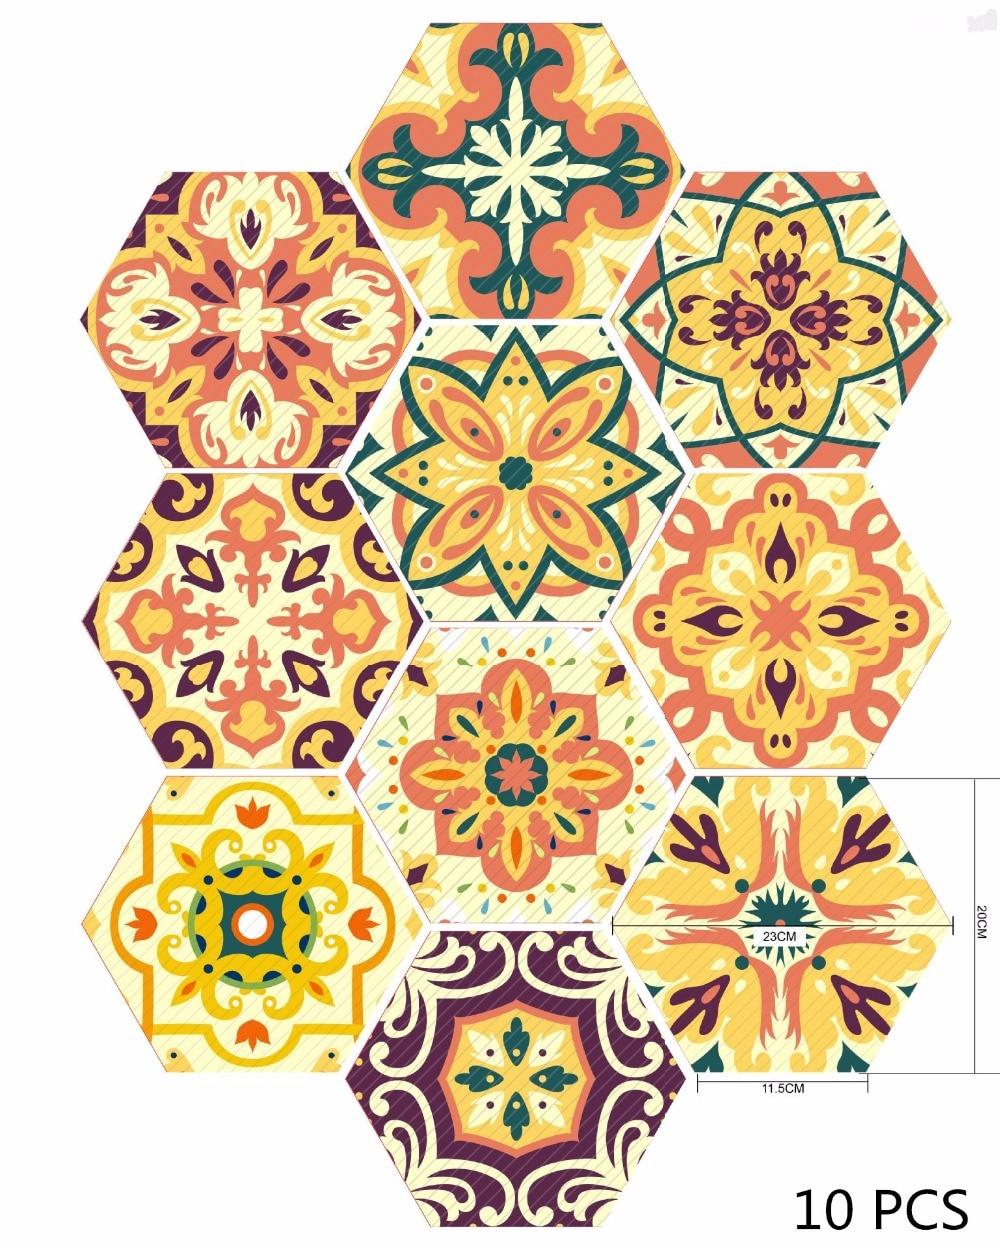 10Pcs Moroccan Style Hexagonal 3D Tile Sticker Creative PVC ...